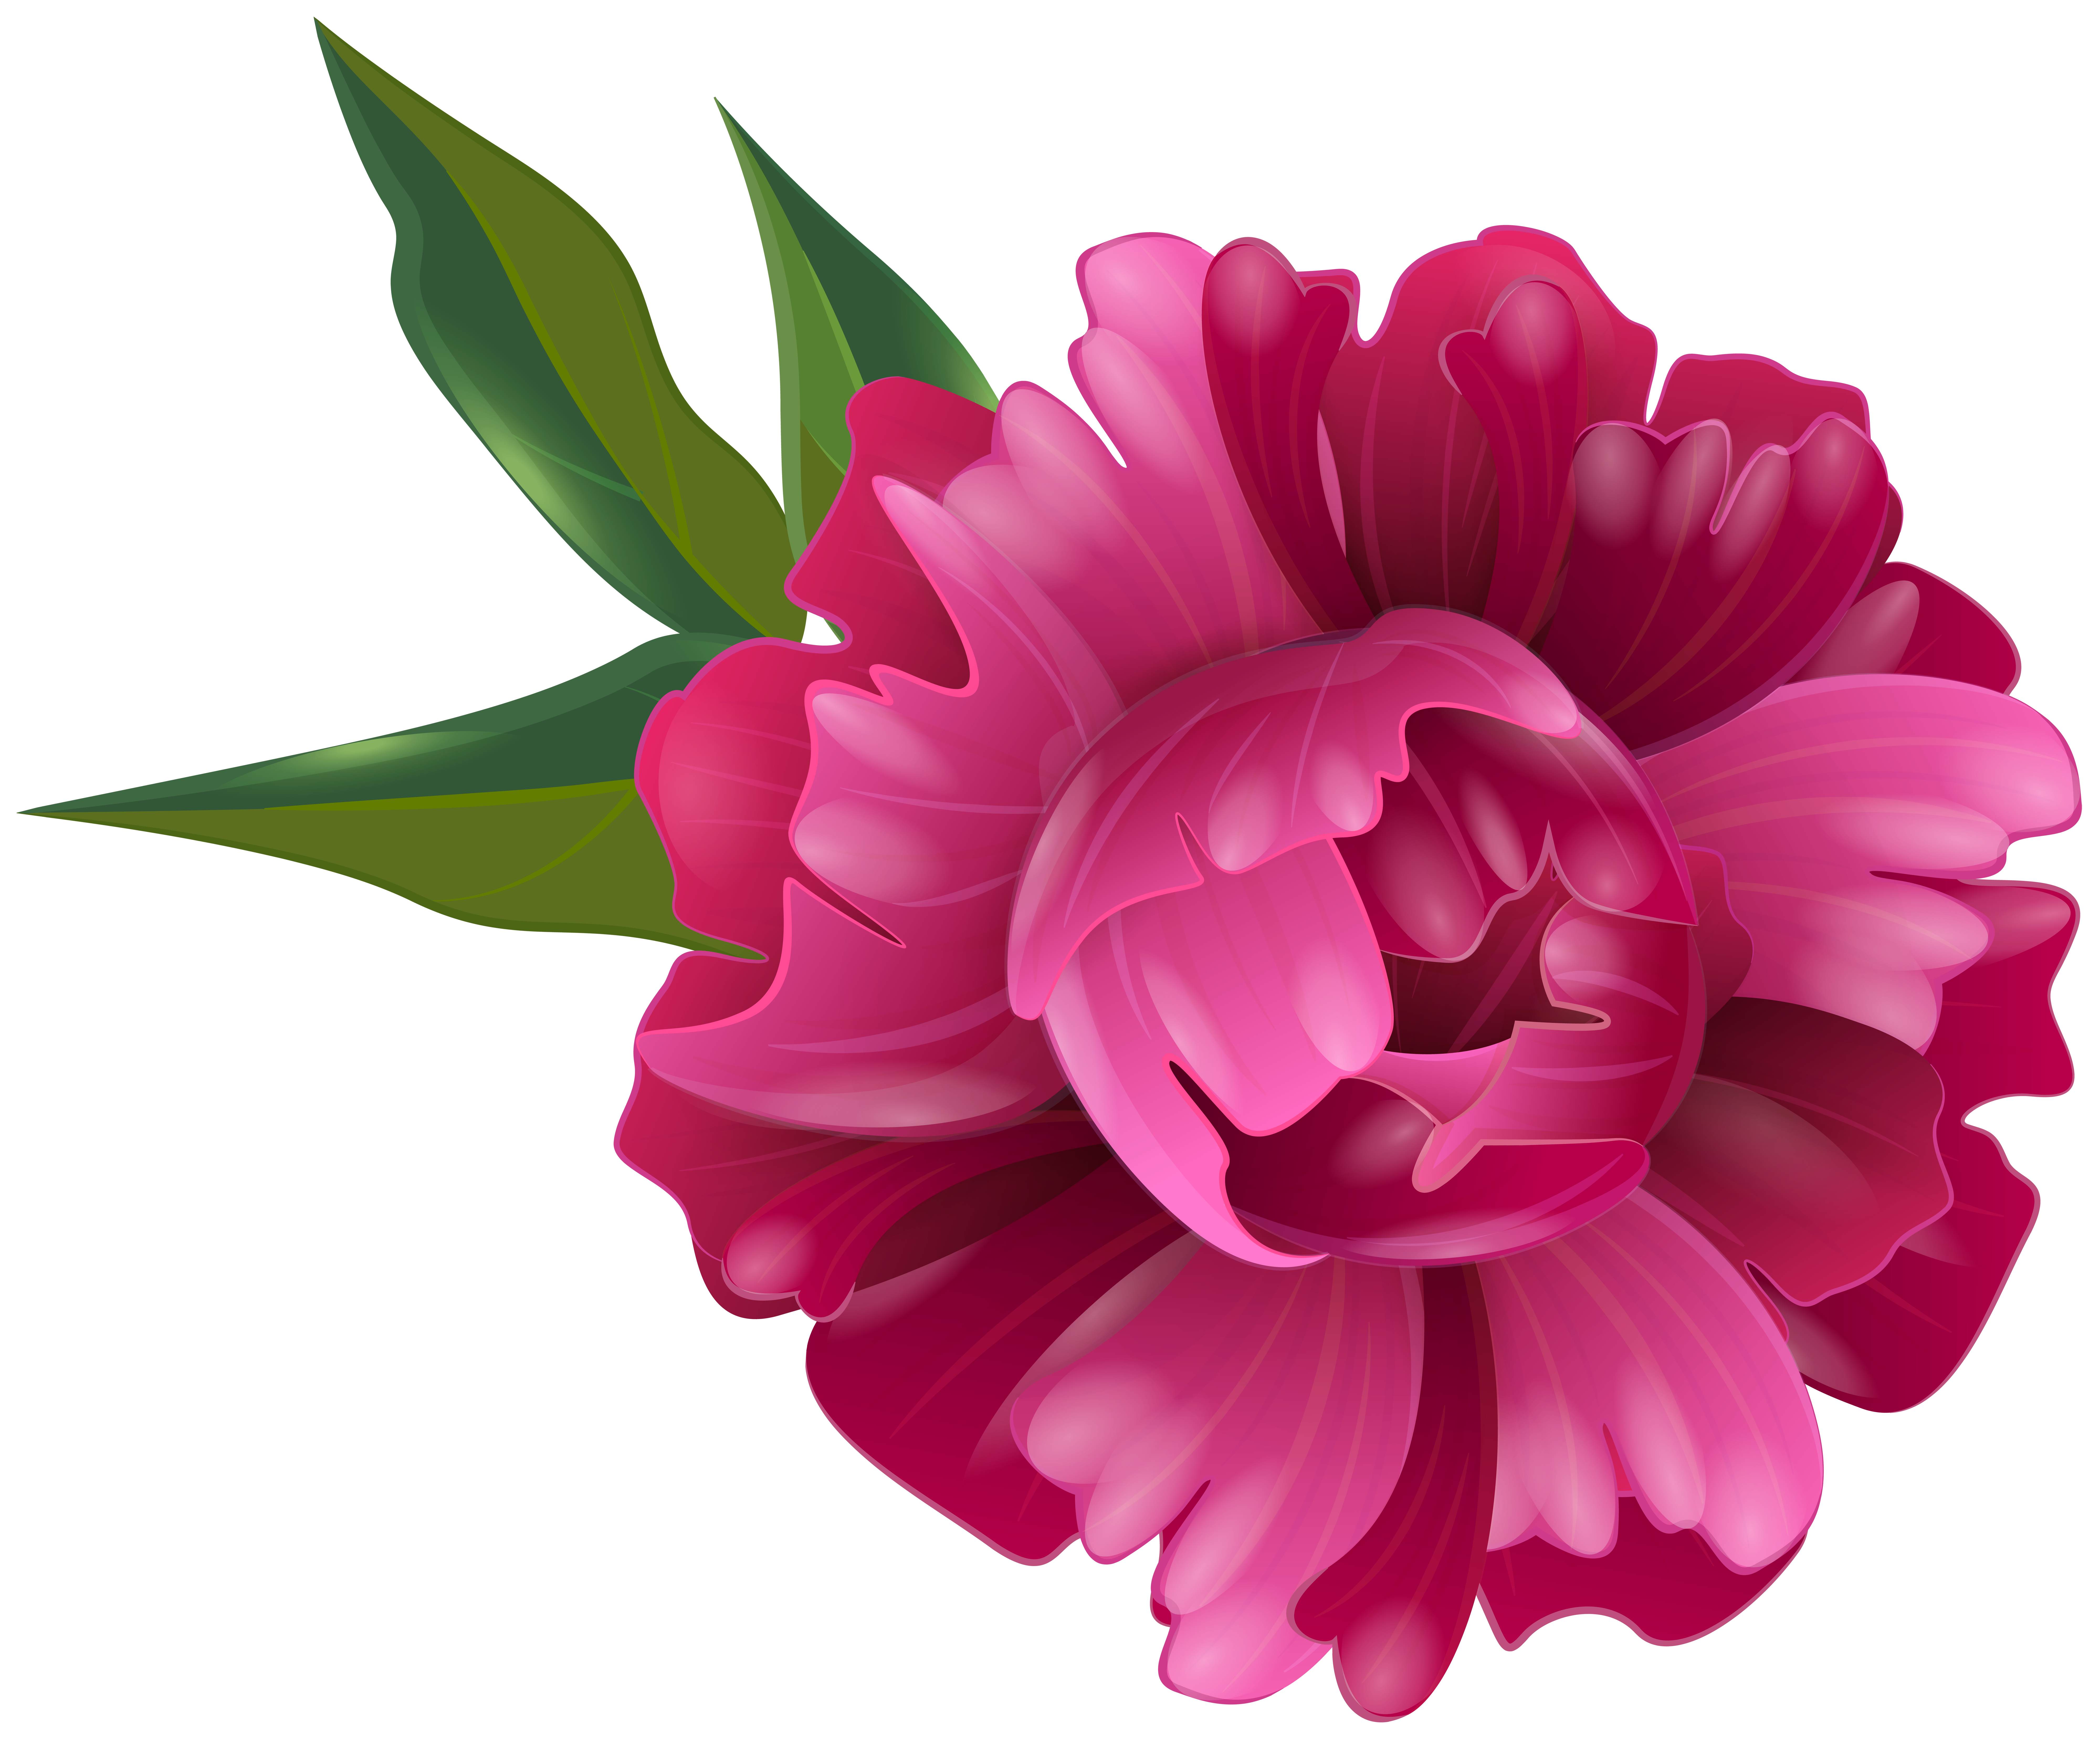 Fuchsia Peony Flower Transparent Image.